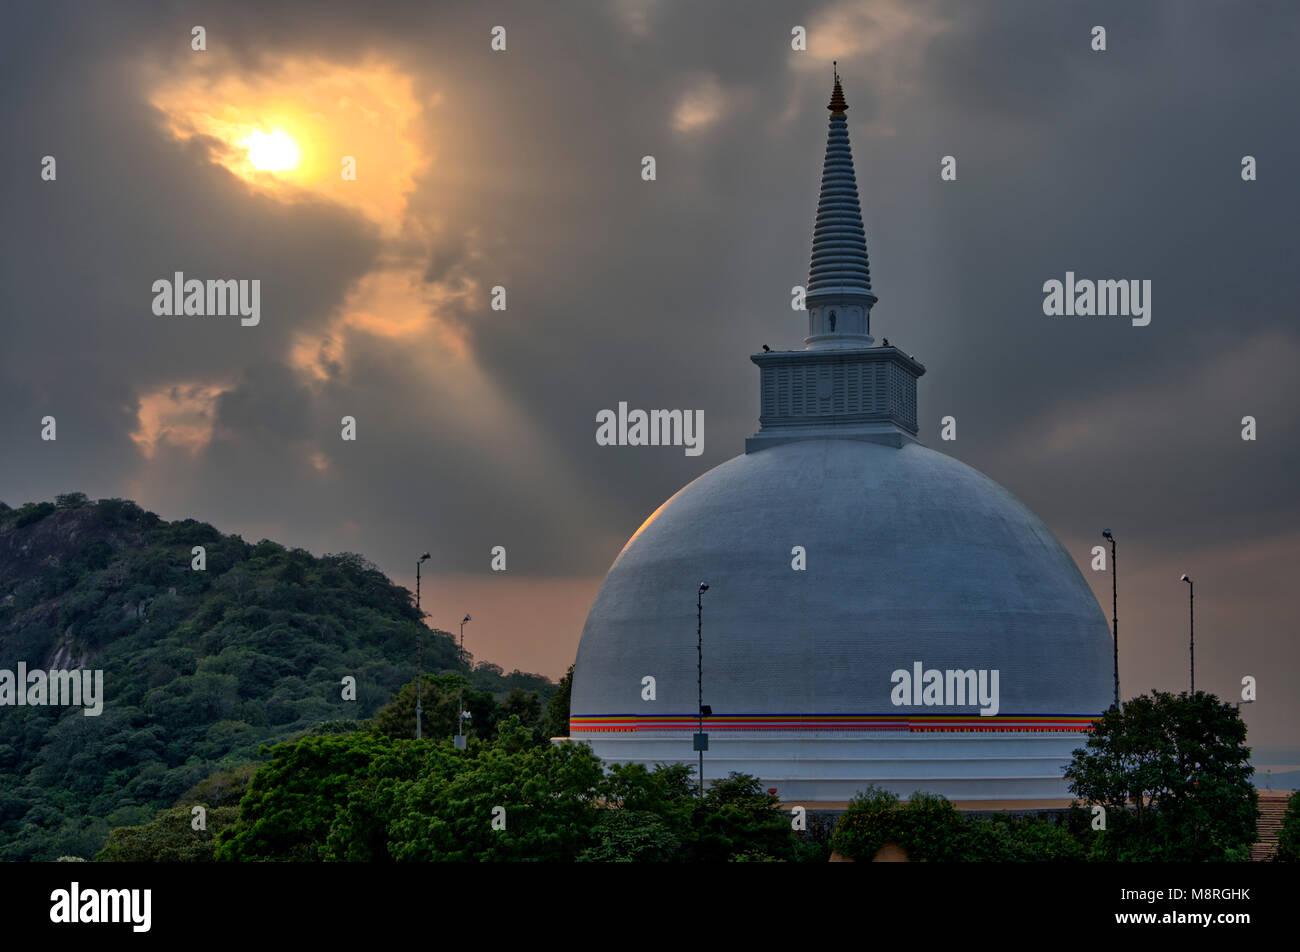 An HDR imgae of the Maha Stupa aka Maha Seya on top of Mihintale Hill in Sri Lanka Stock Photo